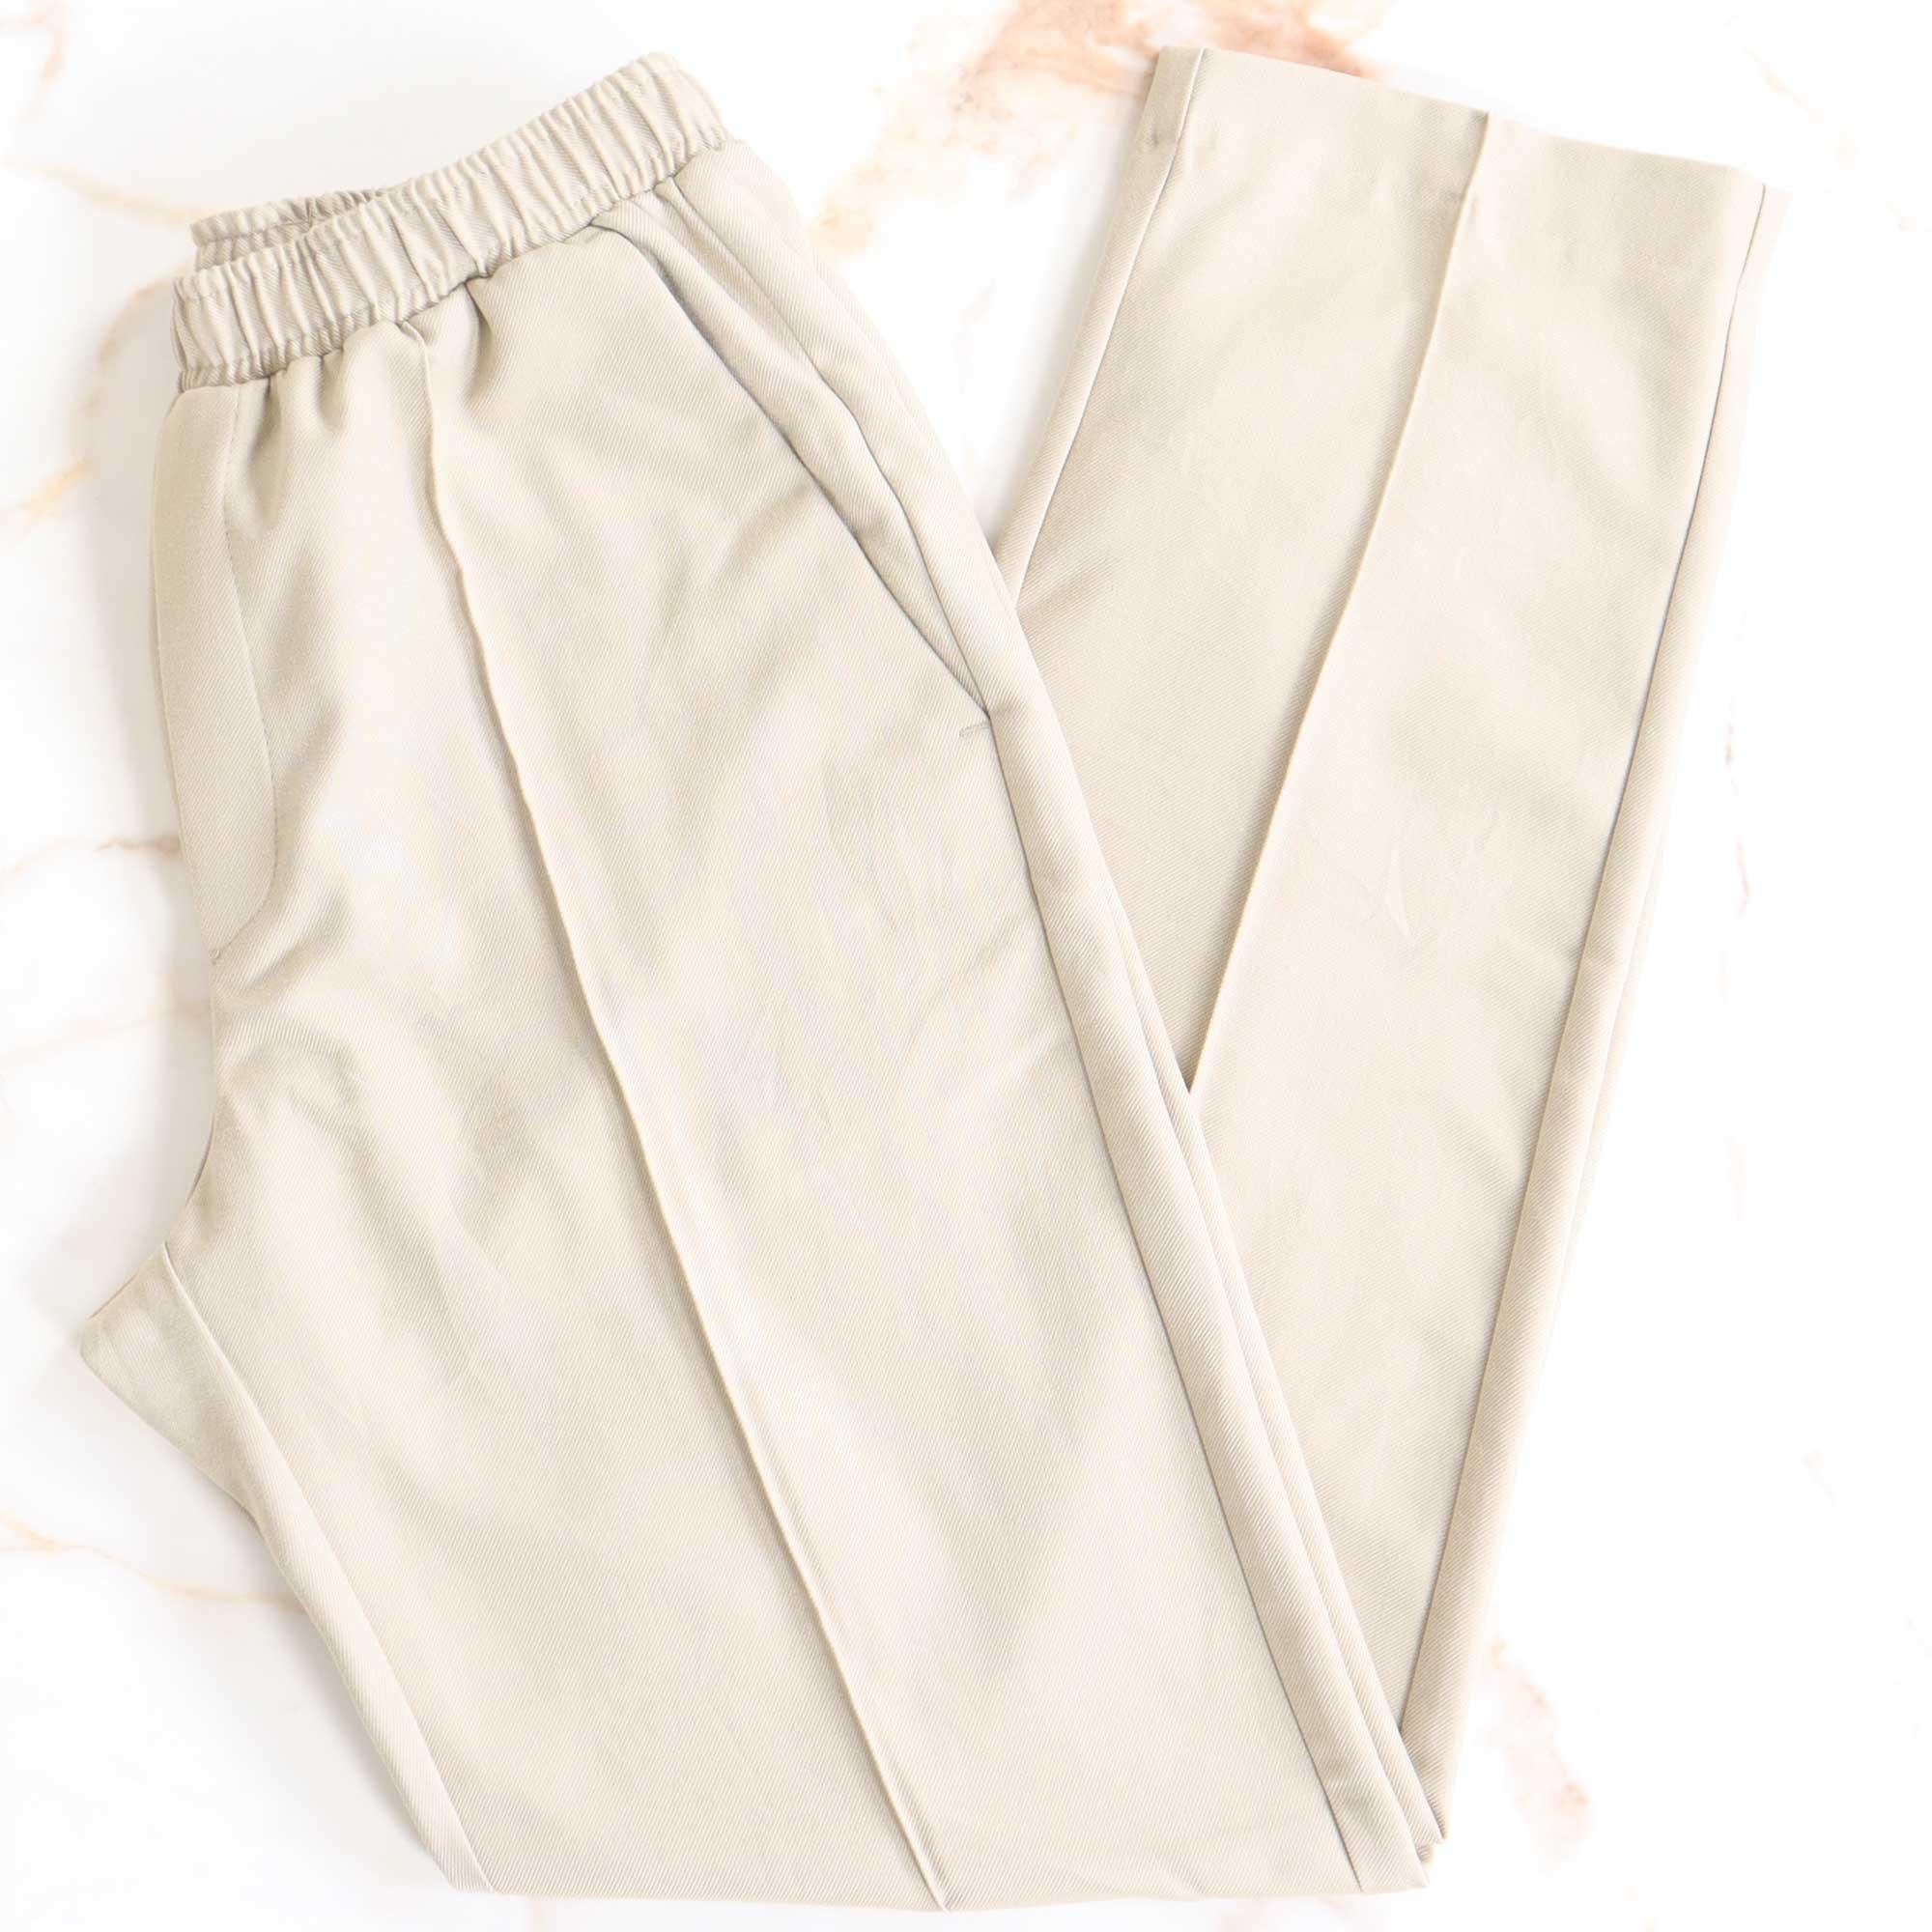 won-pants-beige-1